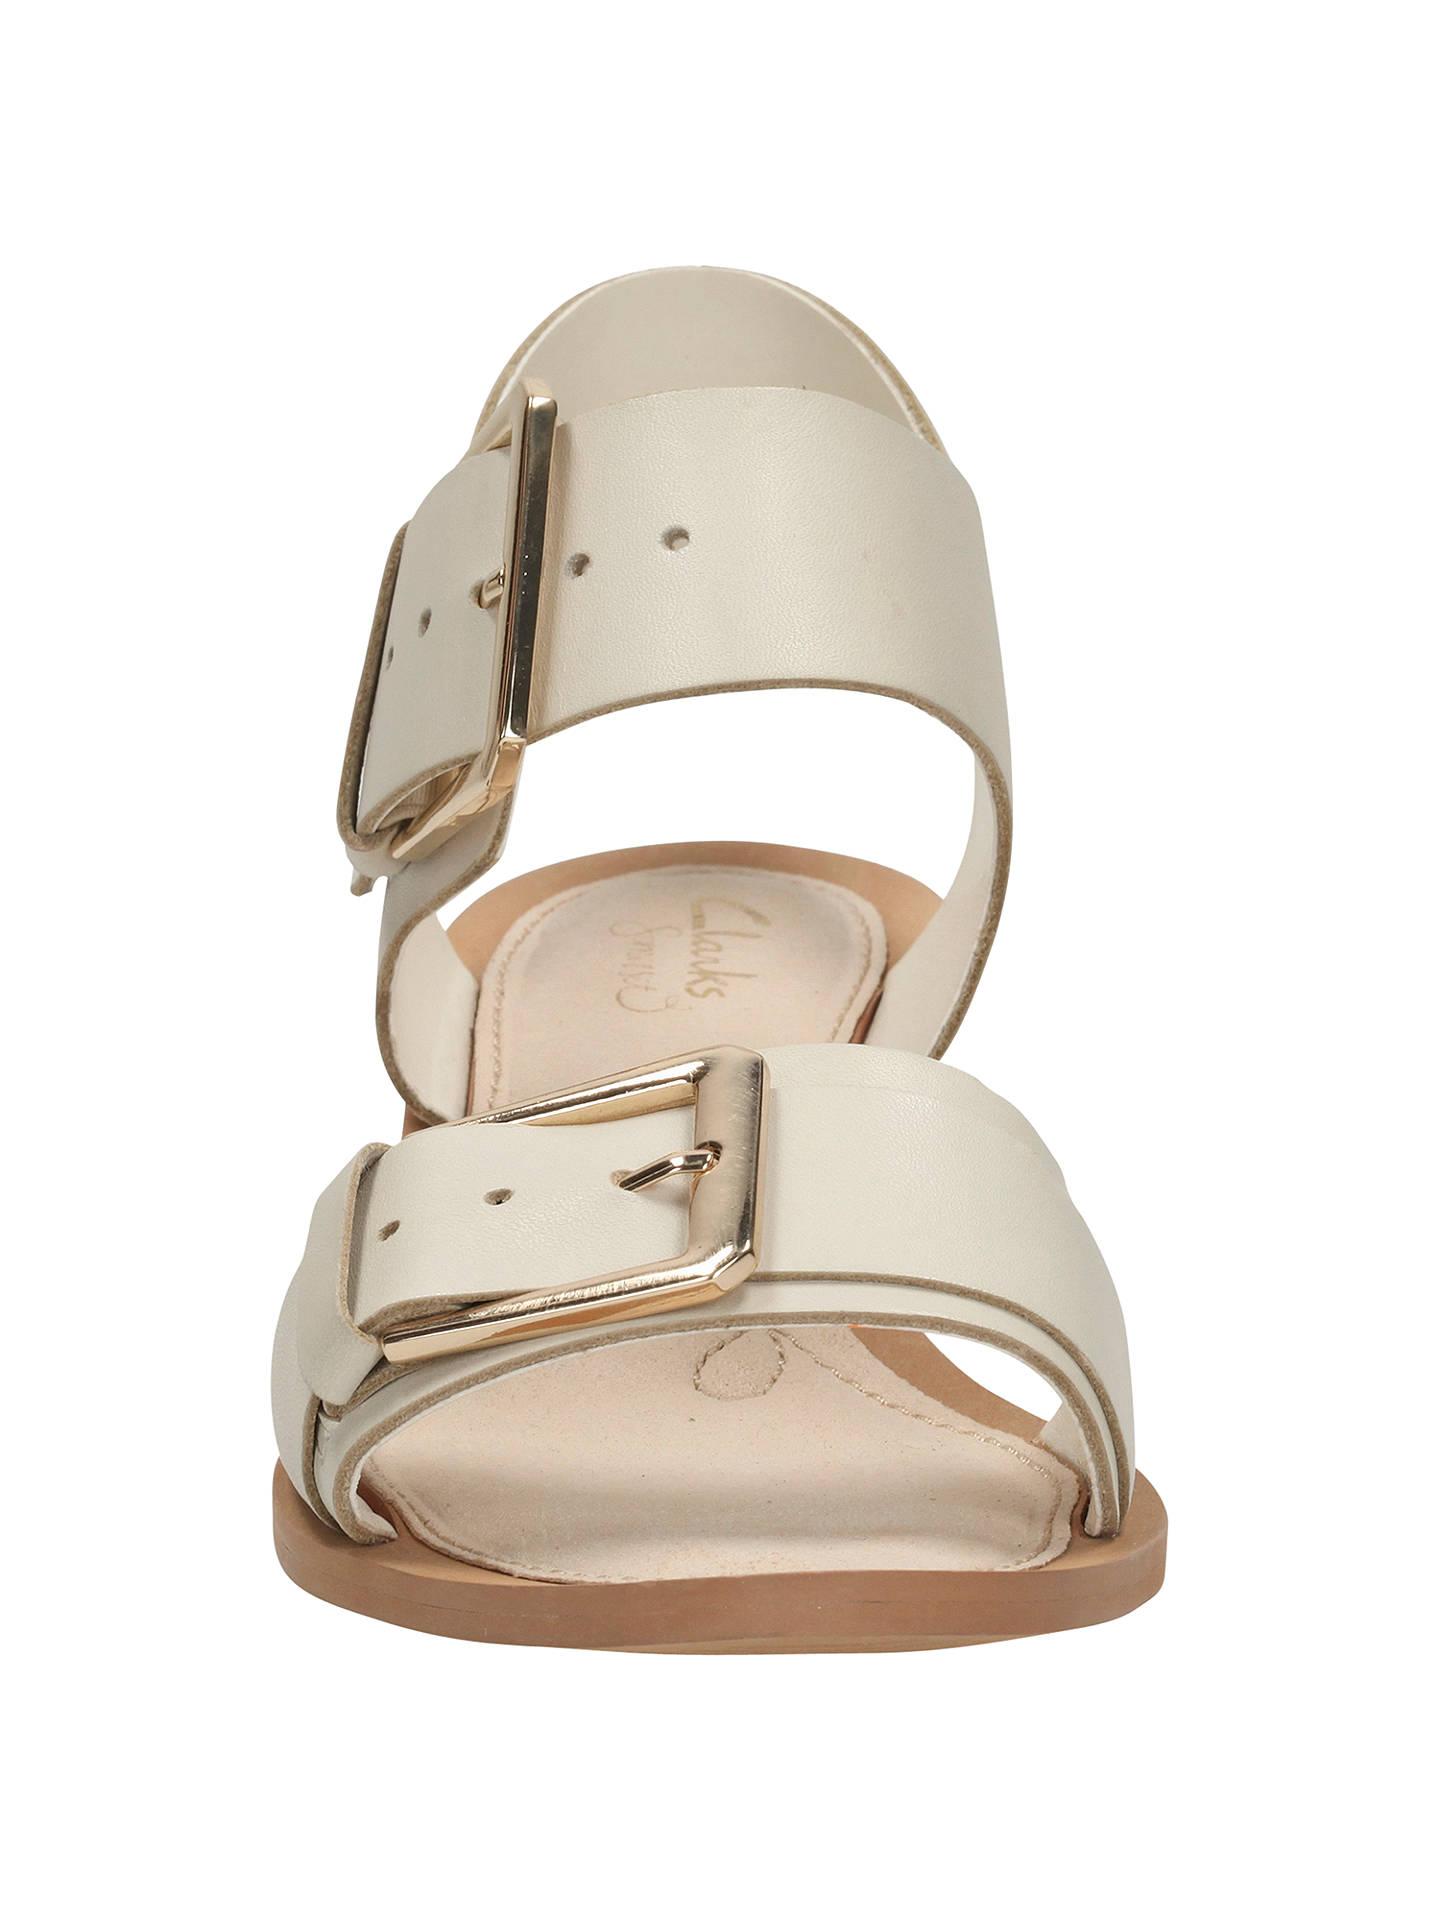 97ebb3bb8e35f ... Buy Clarks Sandcastle Art Leather Sandals